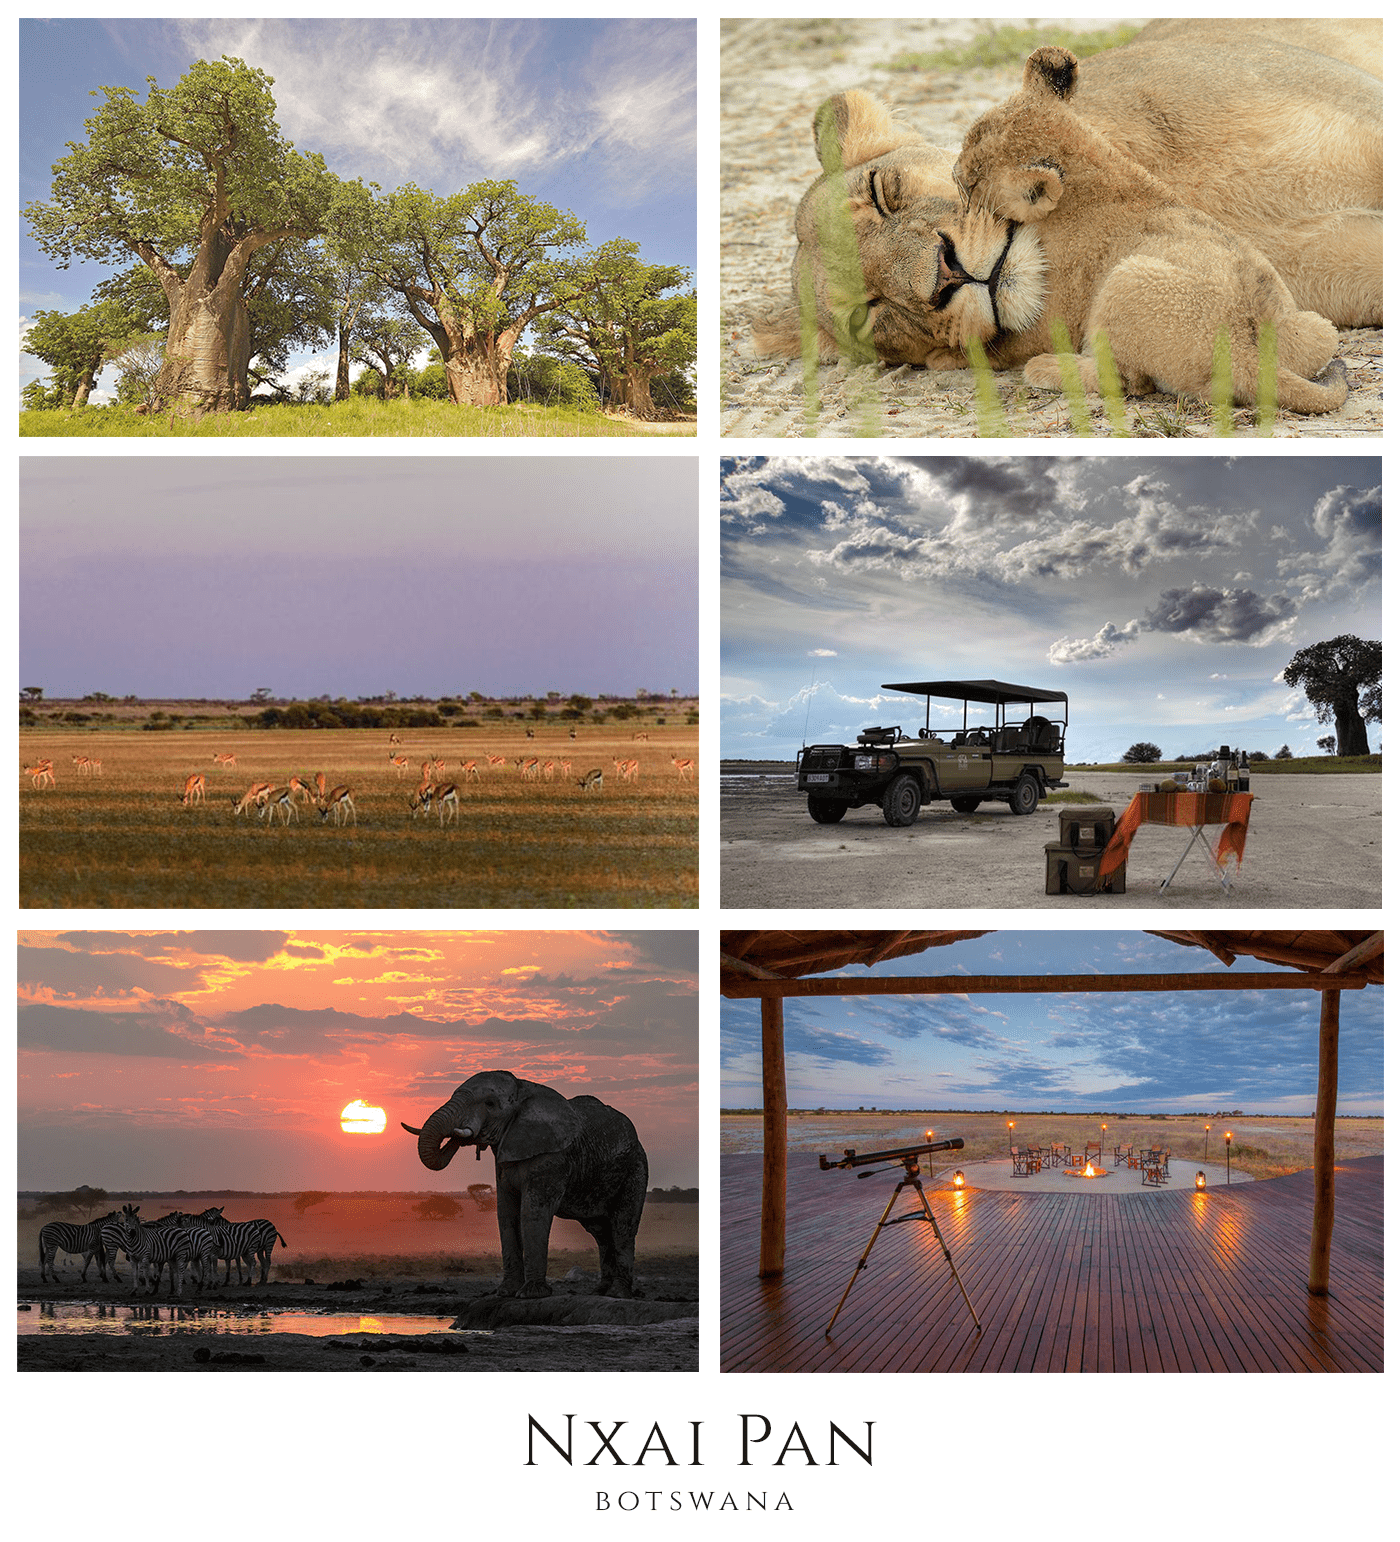 Beautiful views and wildlife at Nxai Pan in Botswana - African Safaris